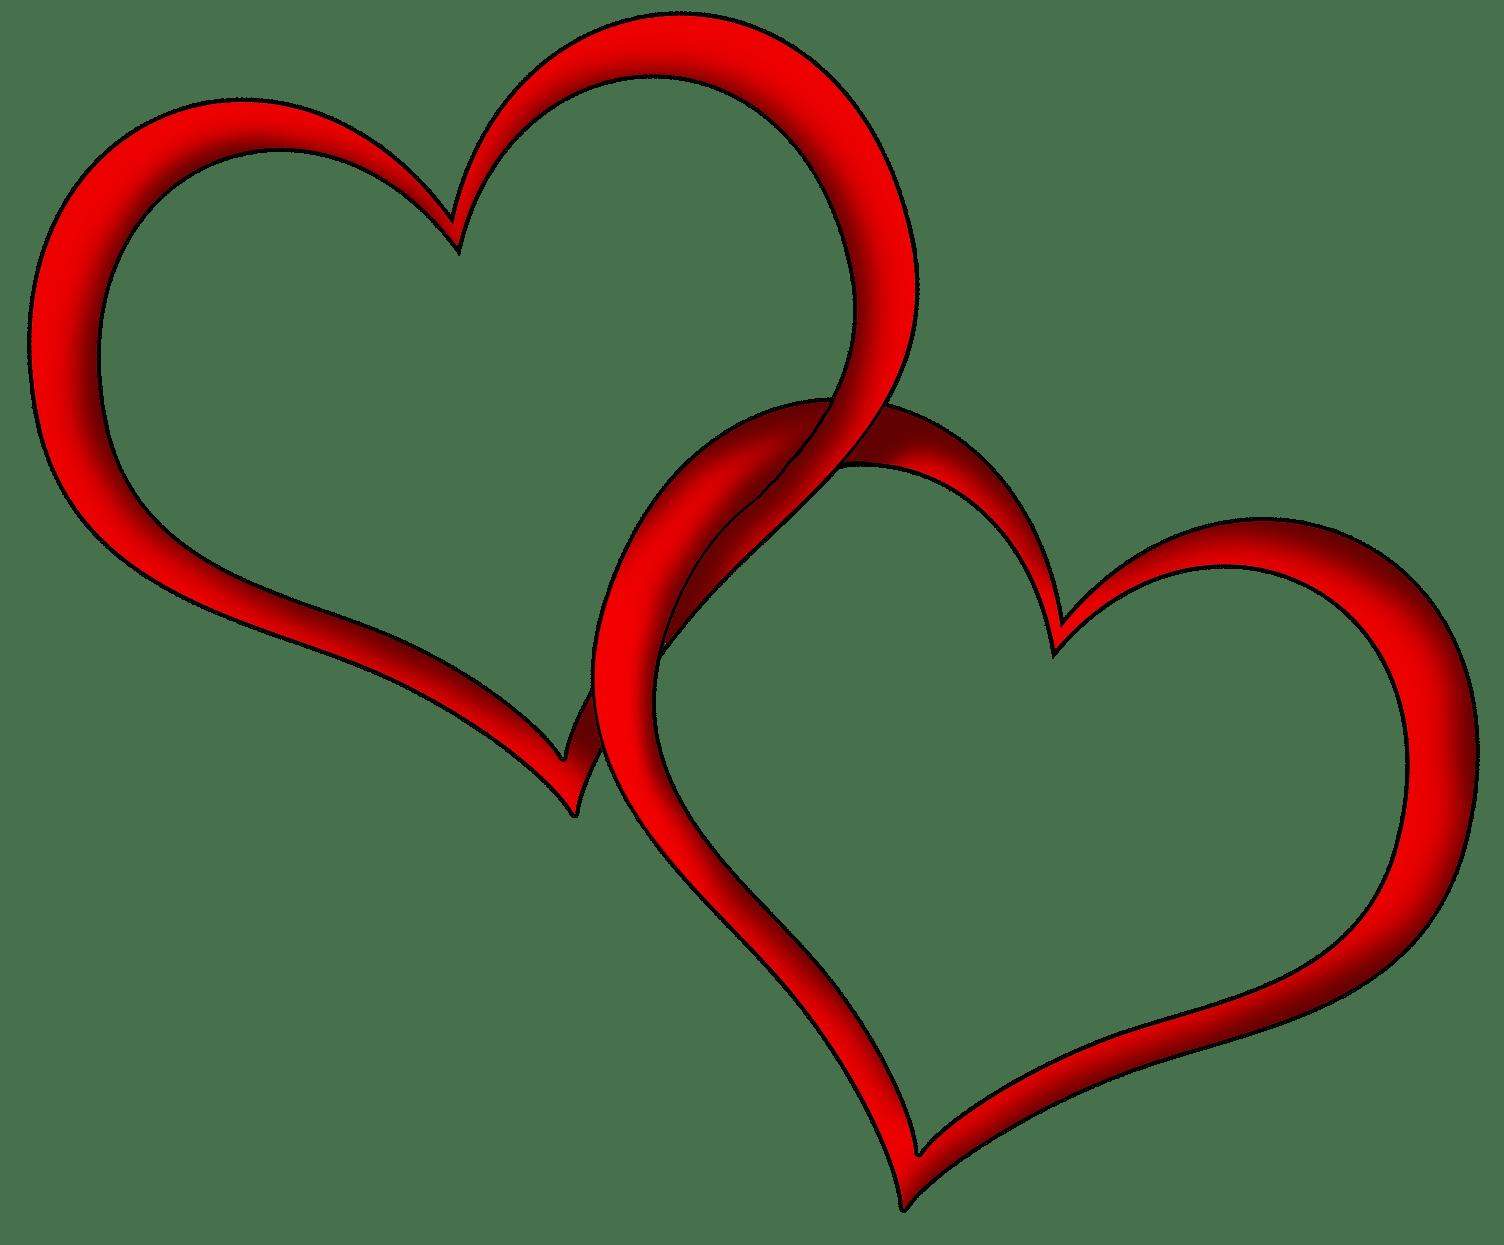 Jpeg heart clipart picture heart-transparent-clipart-1.jpg - Edison Research picture